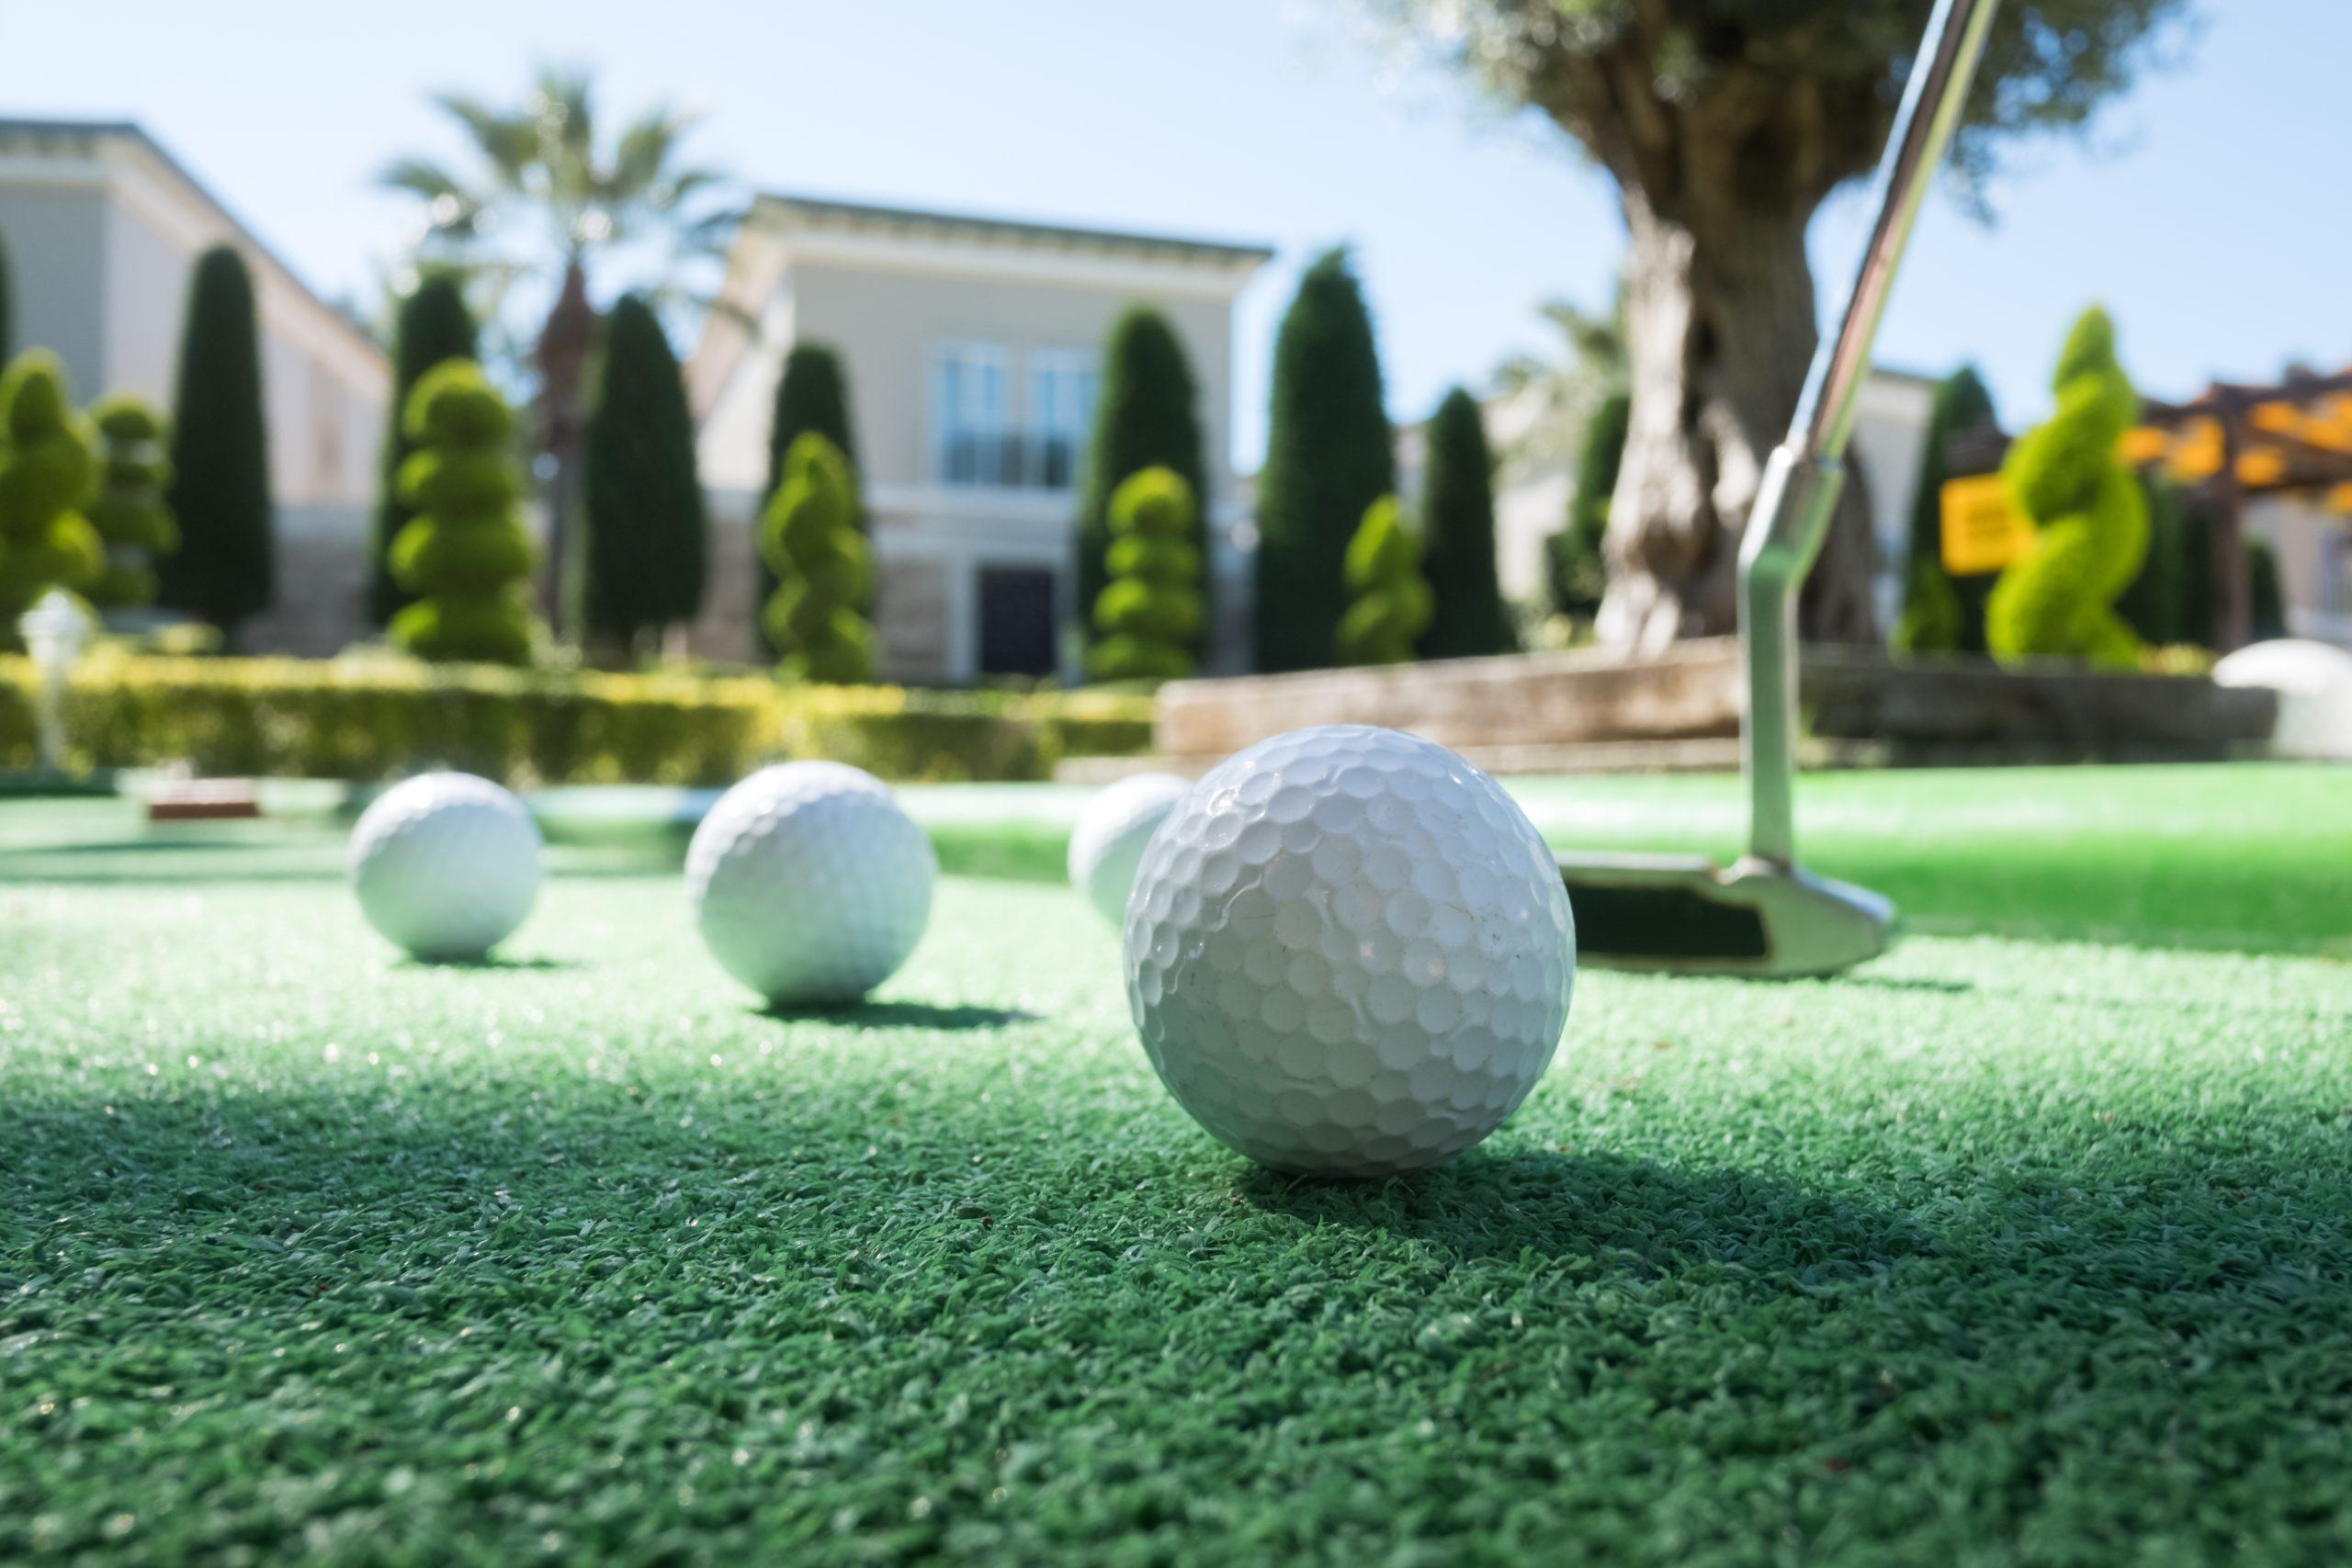 Mini golf scene with ball and club